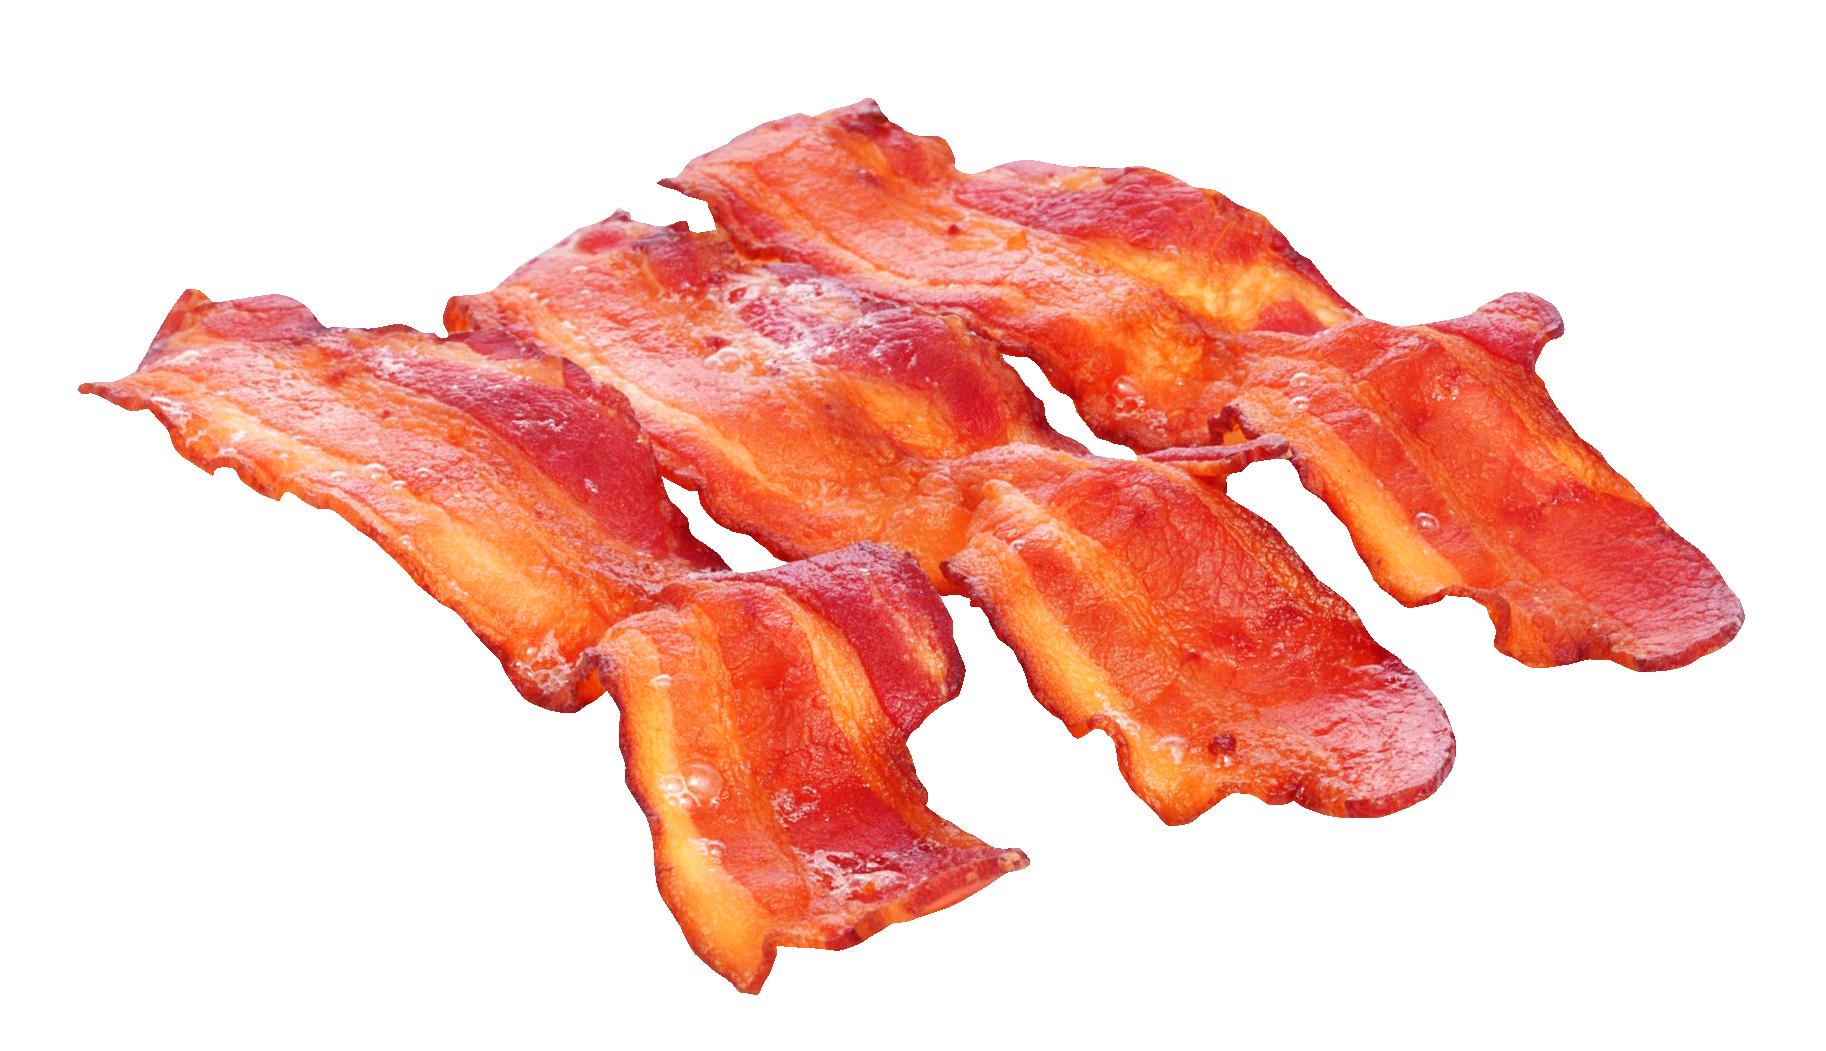 PNGPIX-COM-Bacon-PNG-Transparent-Image.png